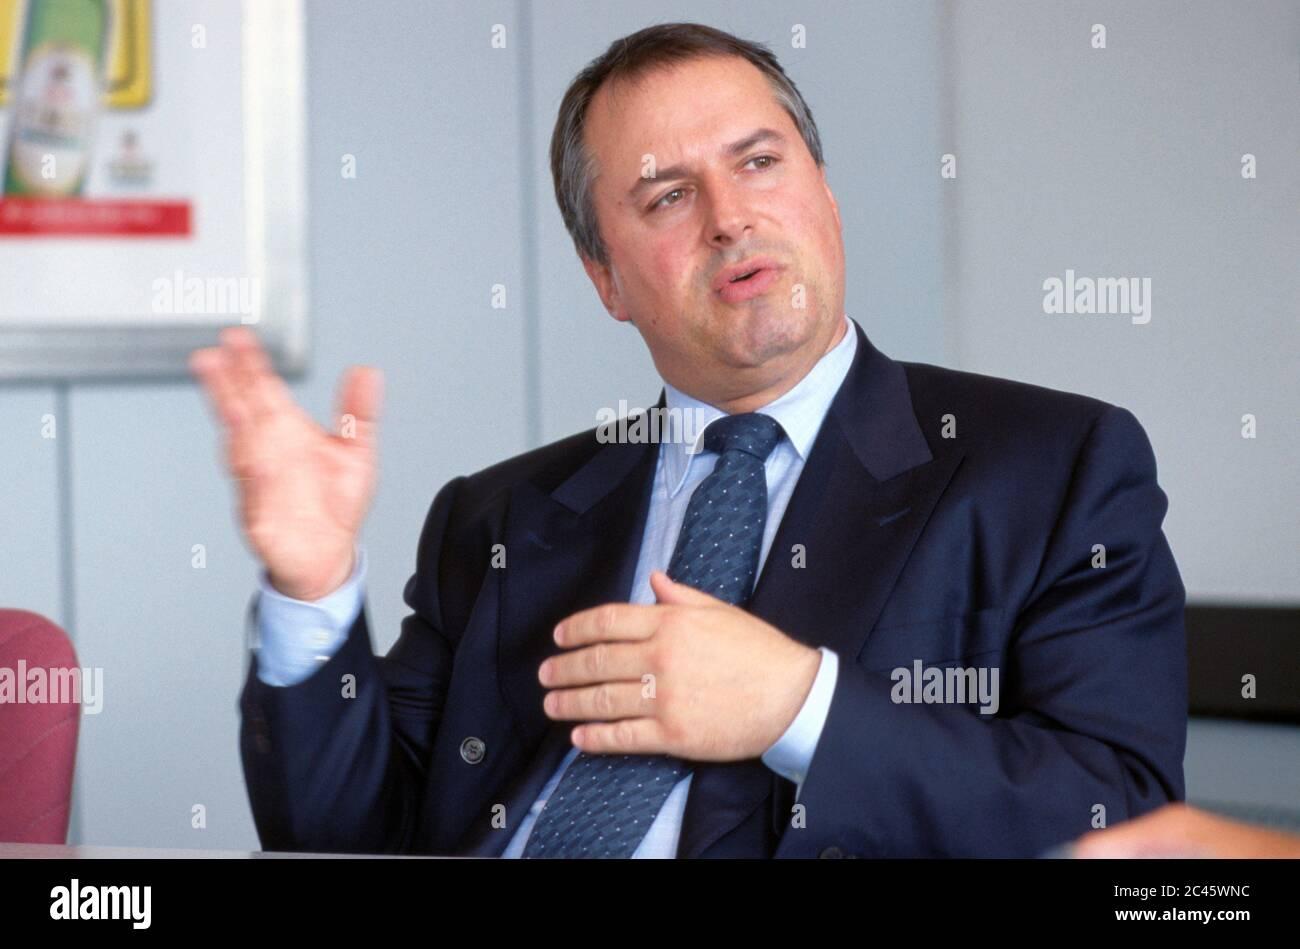 Michael Hollmann - CEO of Brau & Brunnen Stock Photo